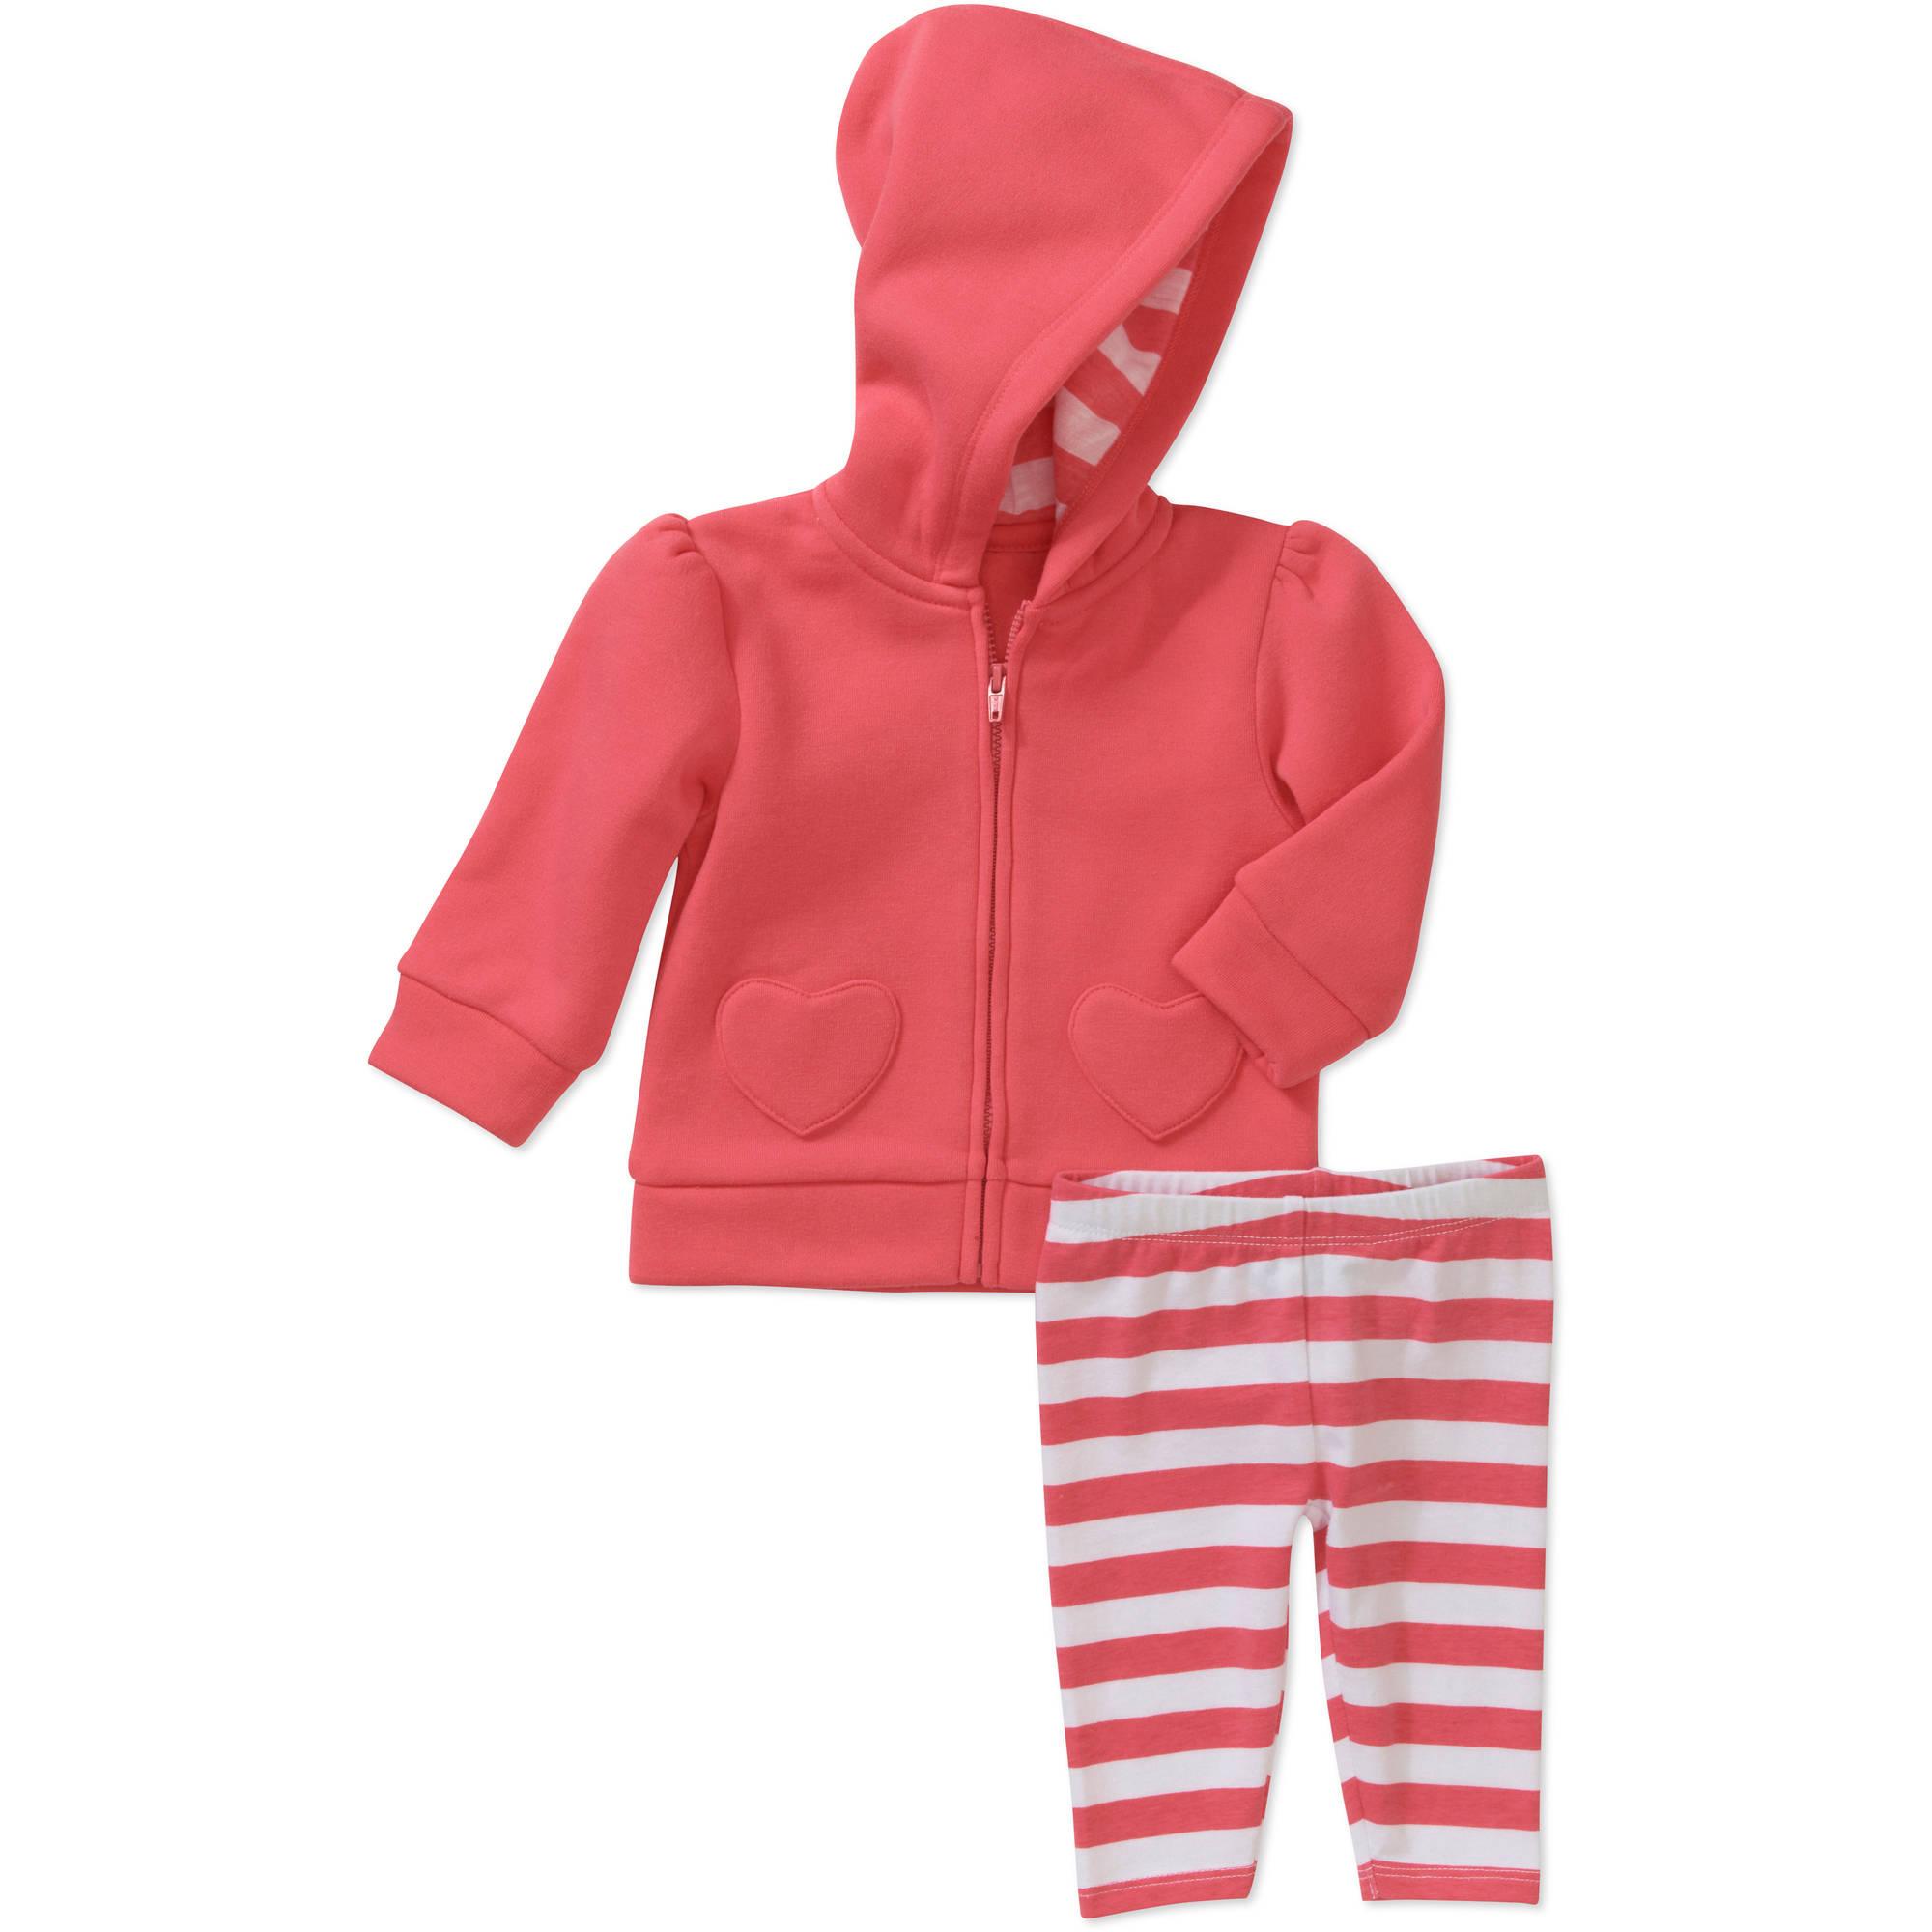 Faded Glory Newborn Girls' 2 Piece Heart Pocket Hoodie and Pant Set